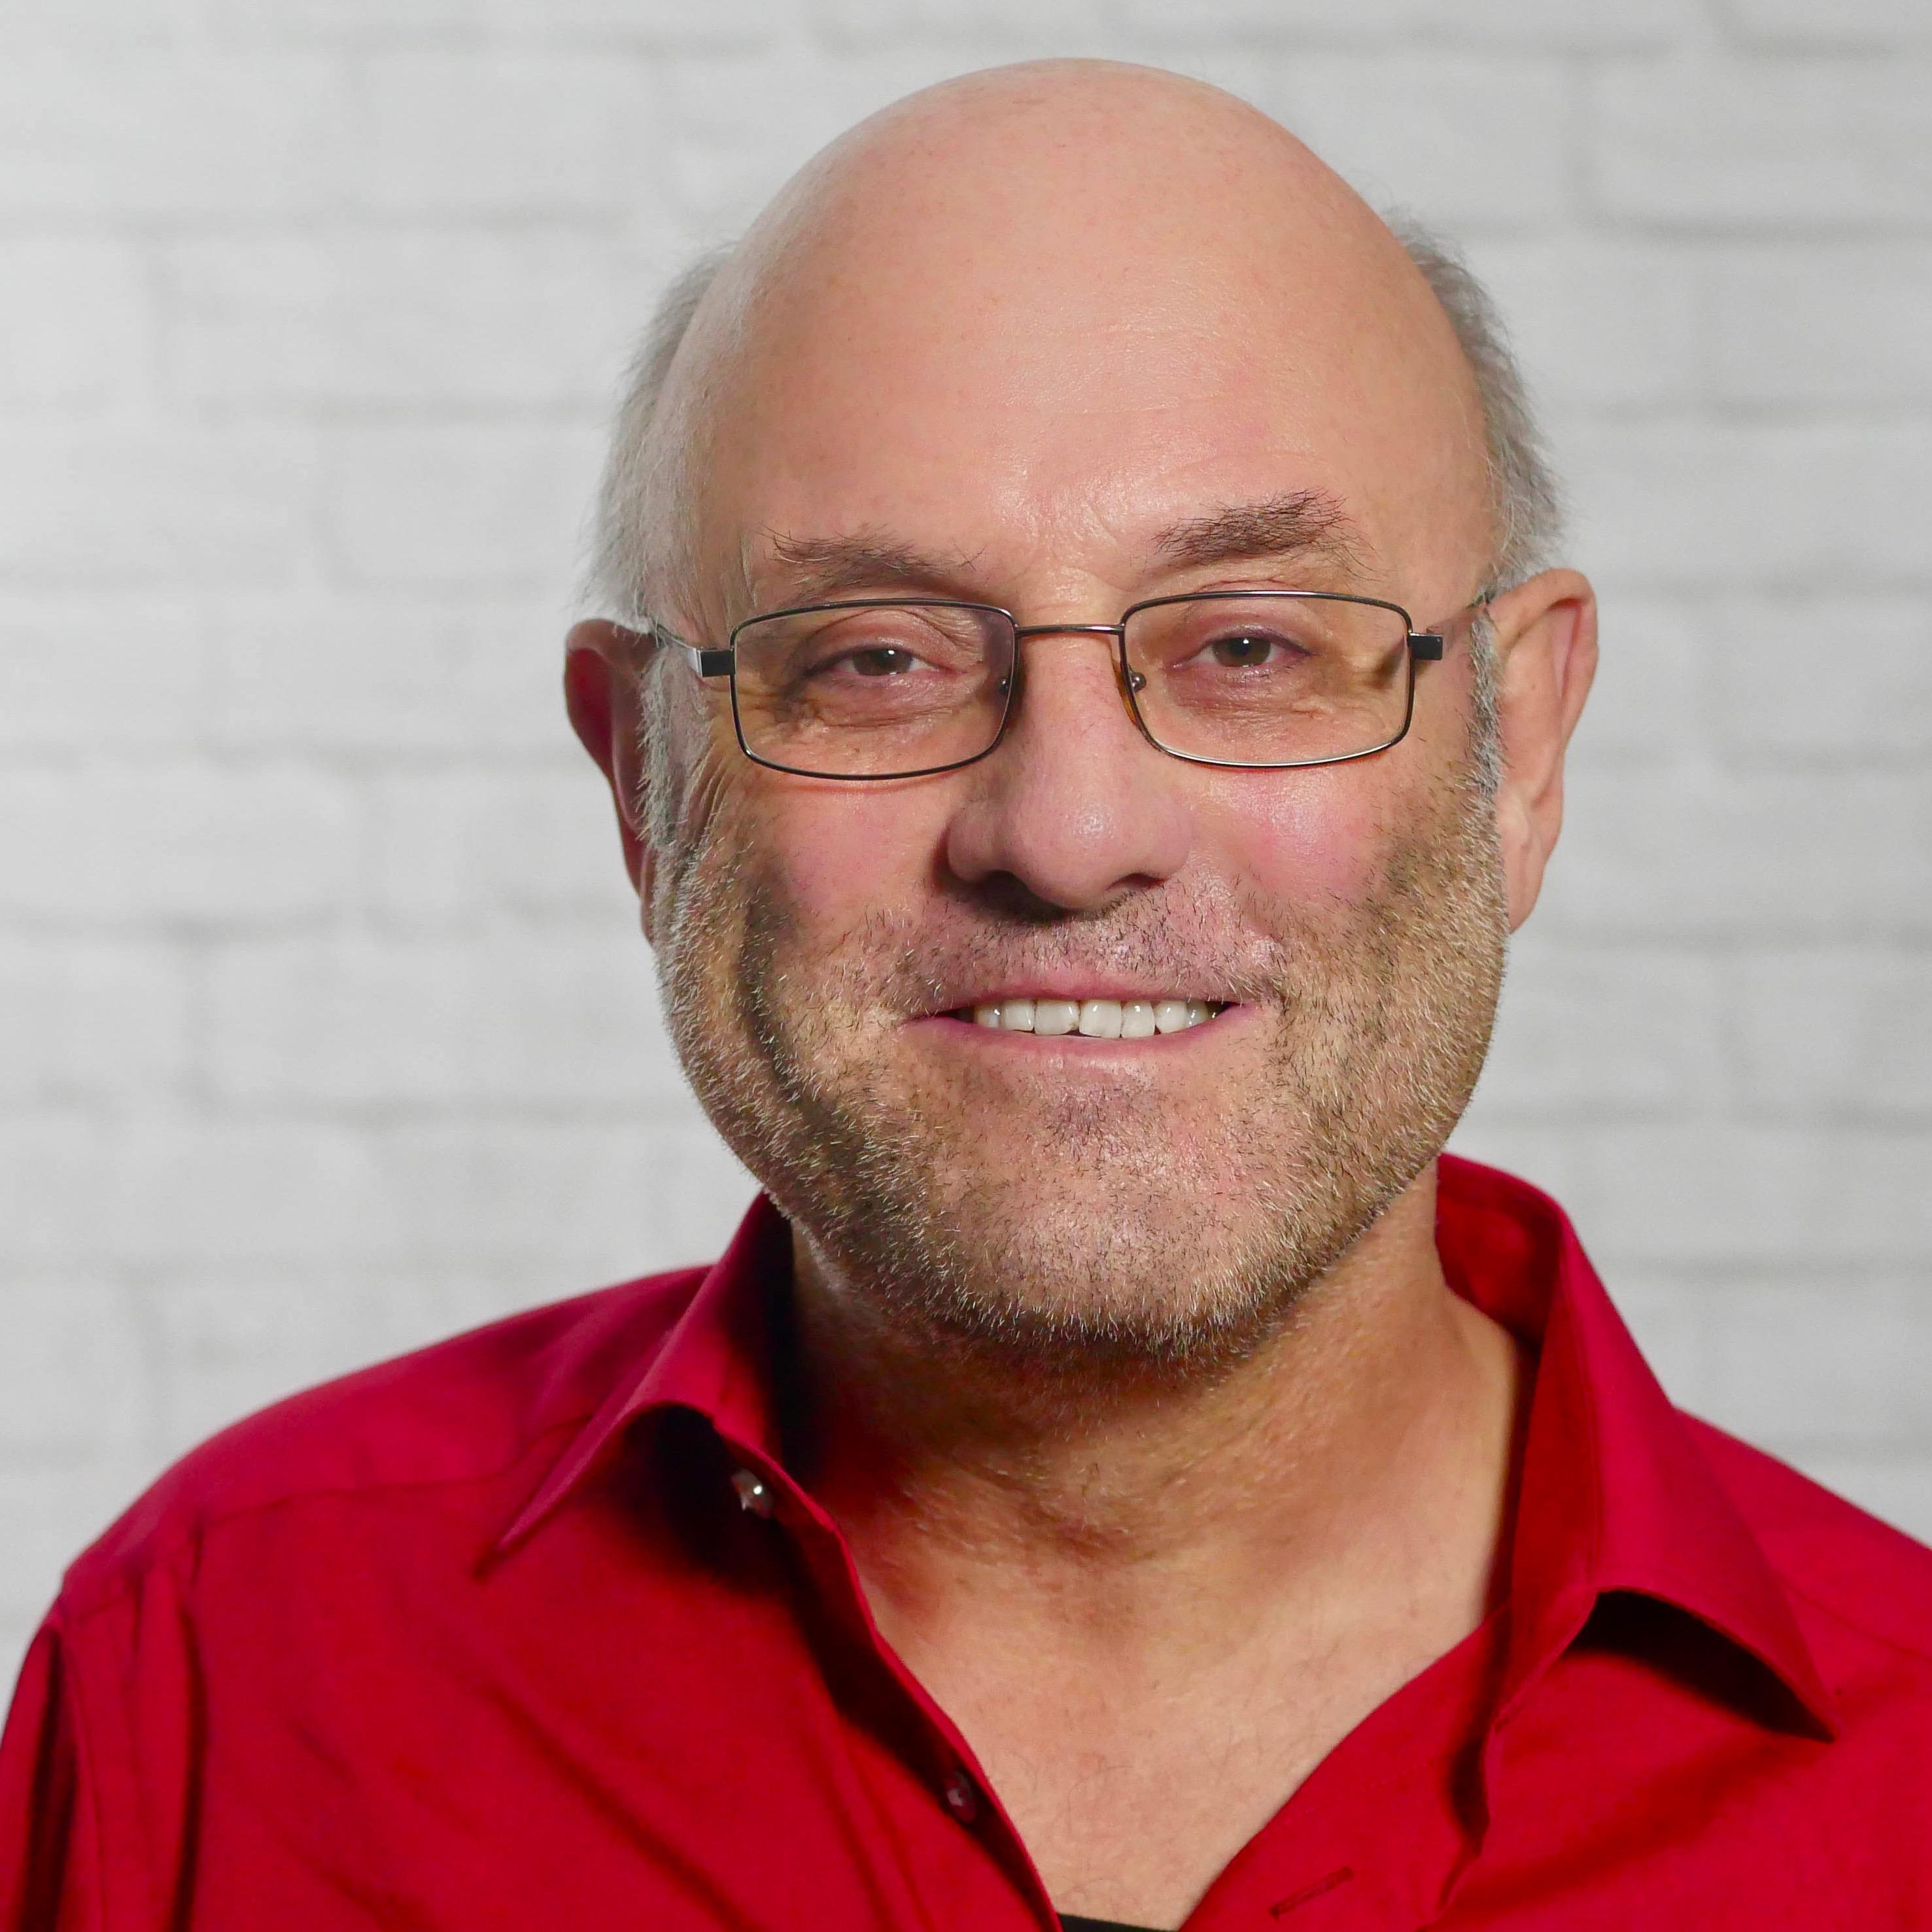 Helmut Ayl